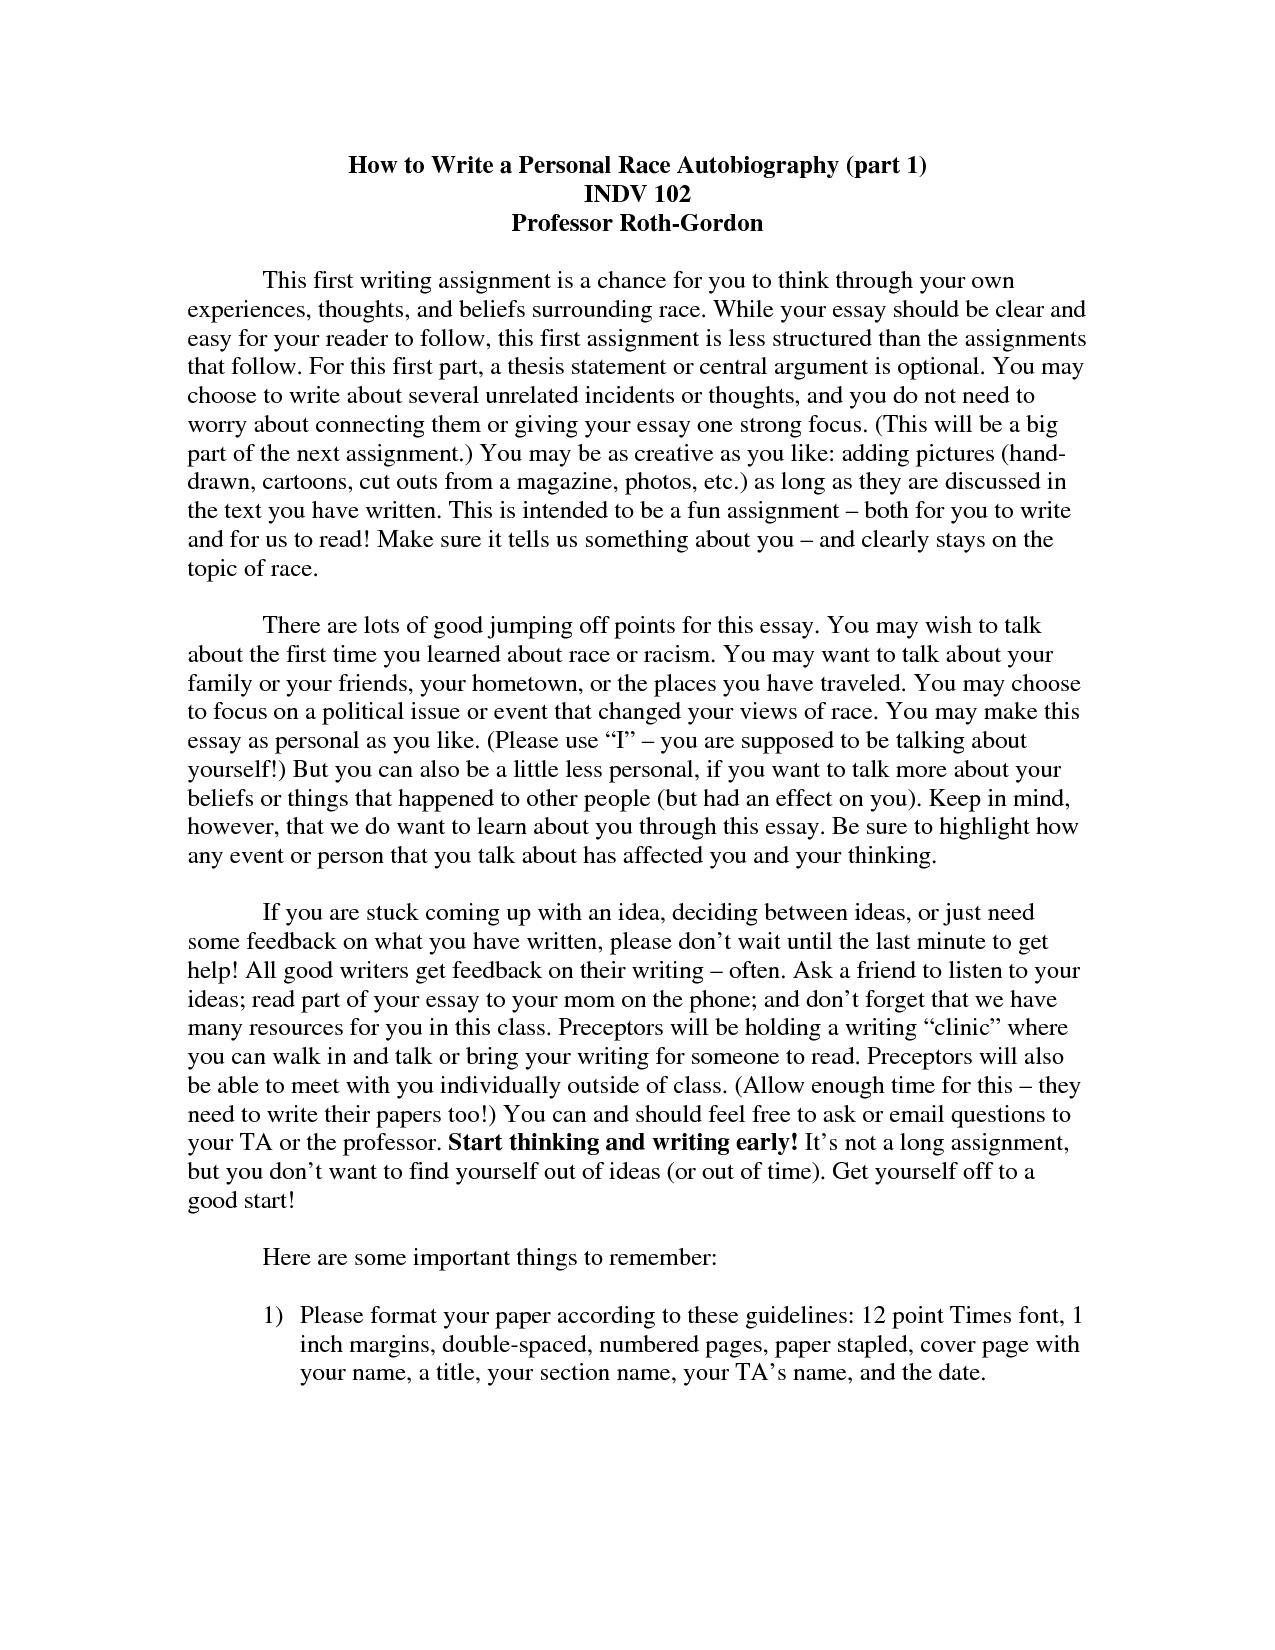 Dissertations on student achievement